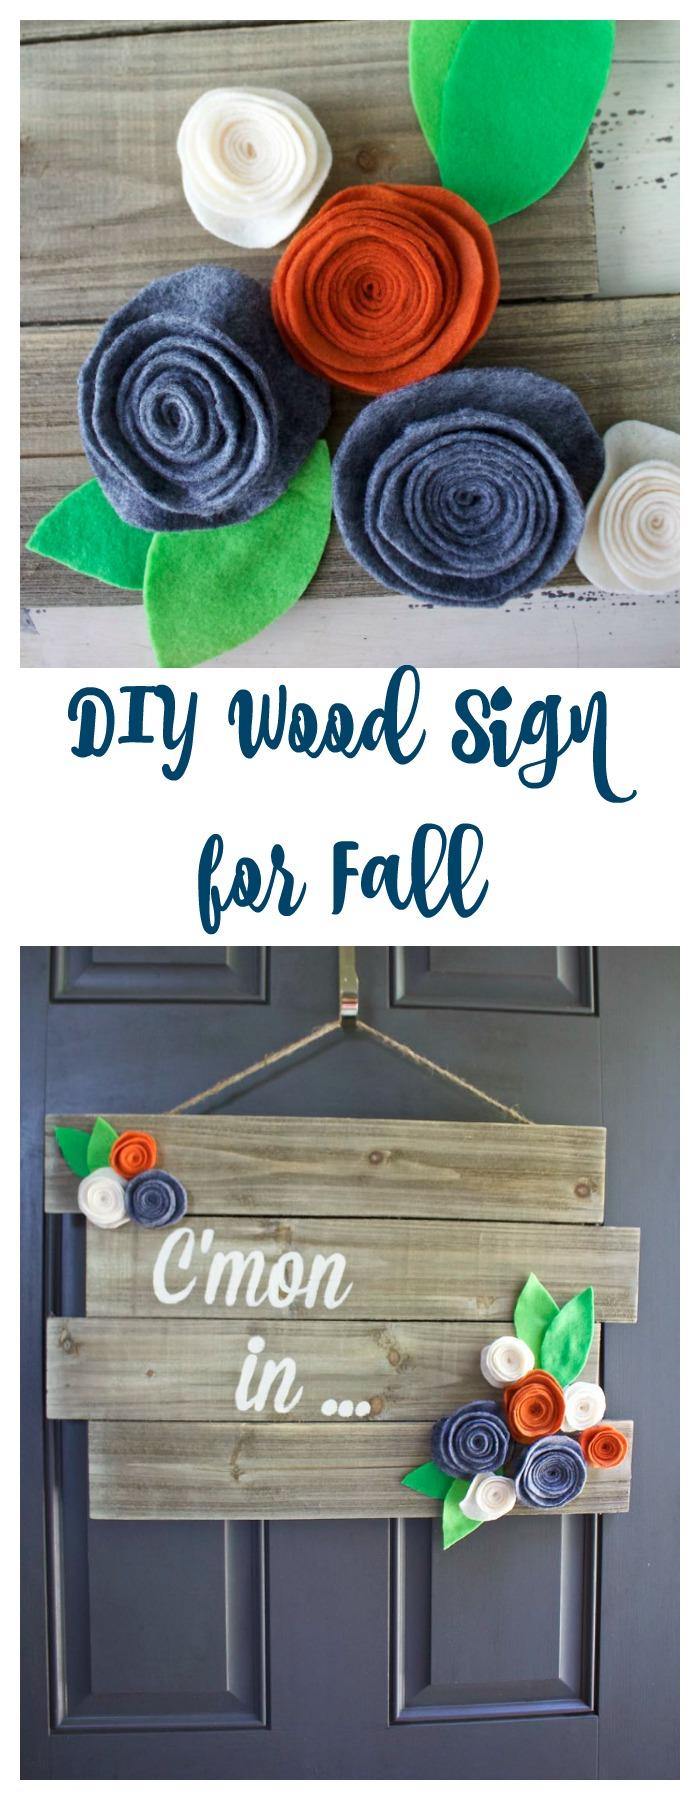 DIY Wood Sign for Fall. Fall decor. Fall door hanger. Fall wreath.